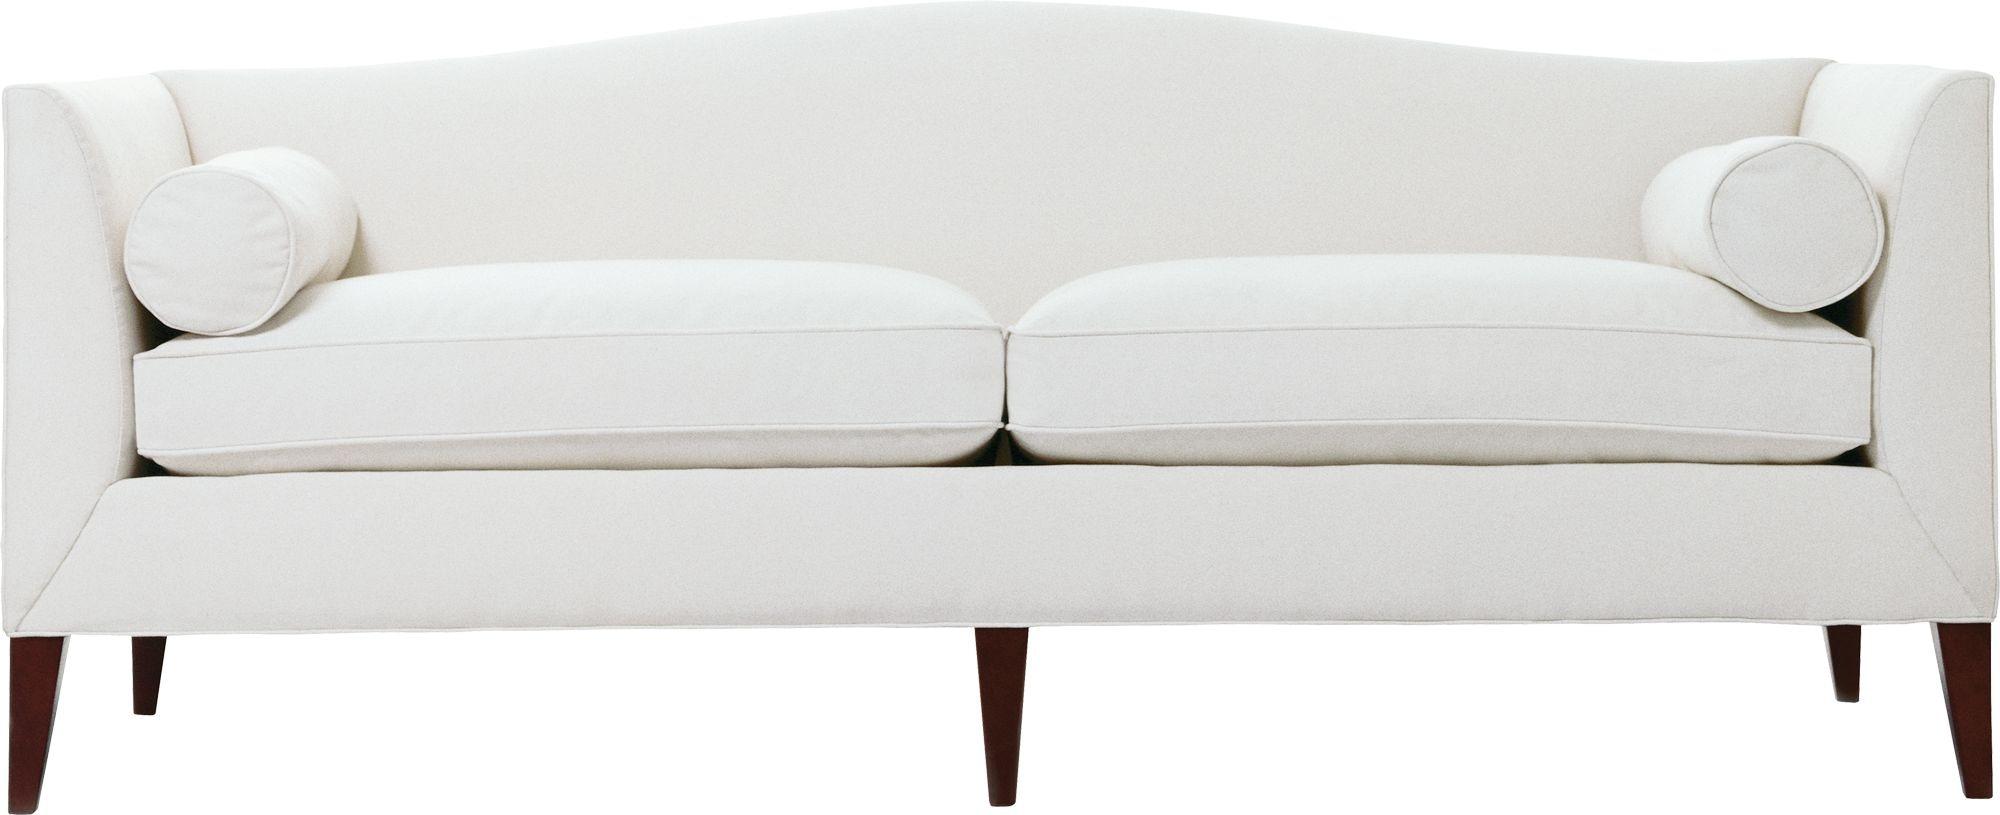 archetype furniture. Baker Furniture Classics Upholstery Archetype Sofa 6386-80 L